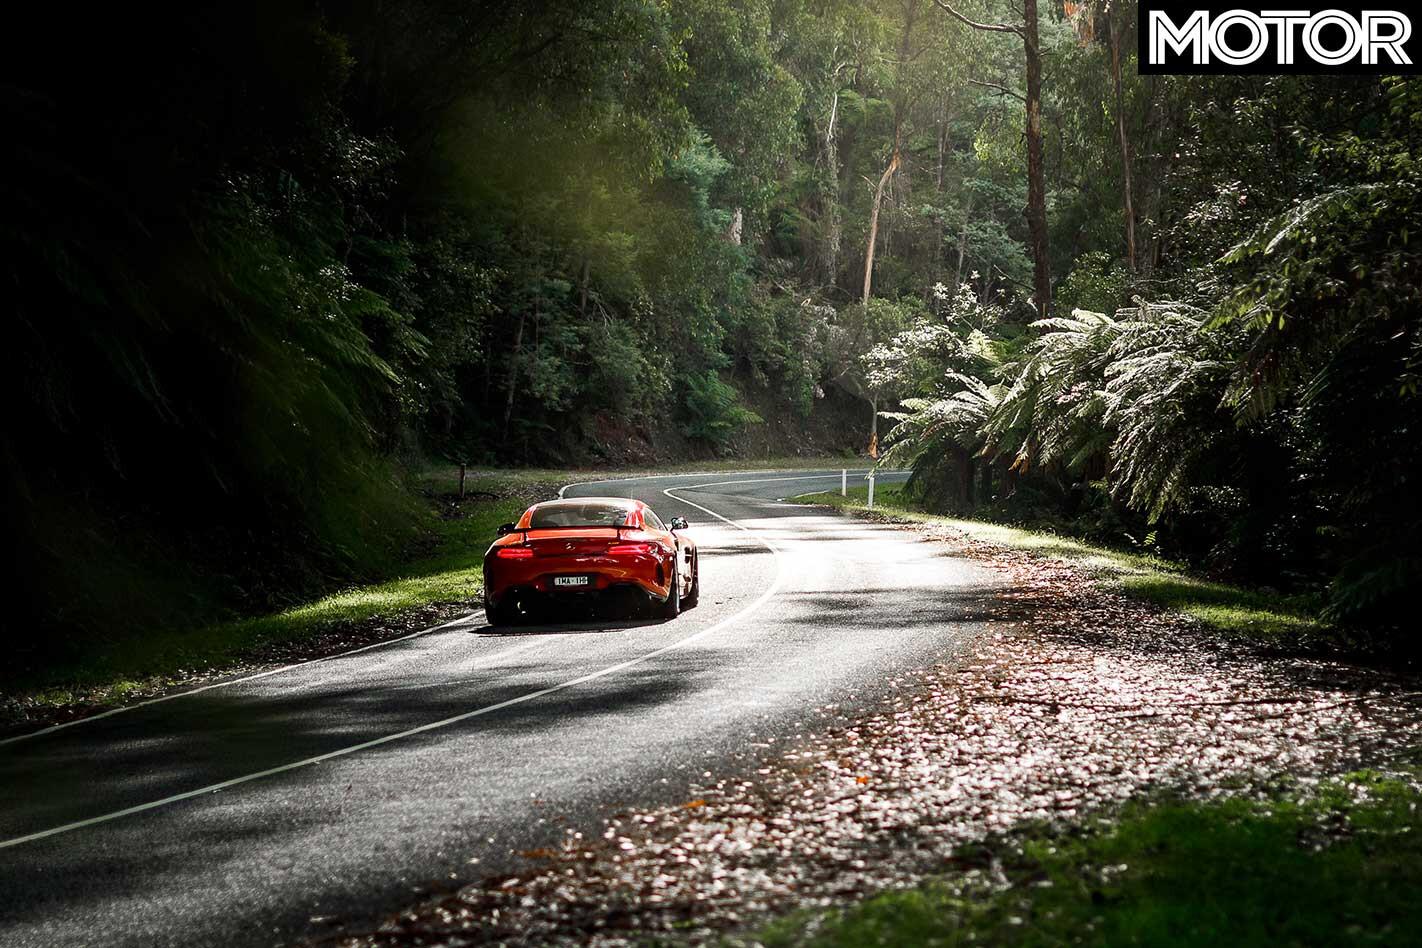 2019 Mercedes AMG GT R 12 Hours Review Road Handling Jpg